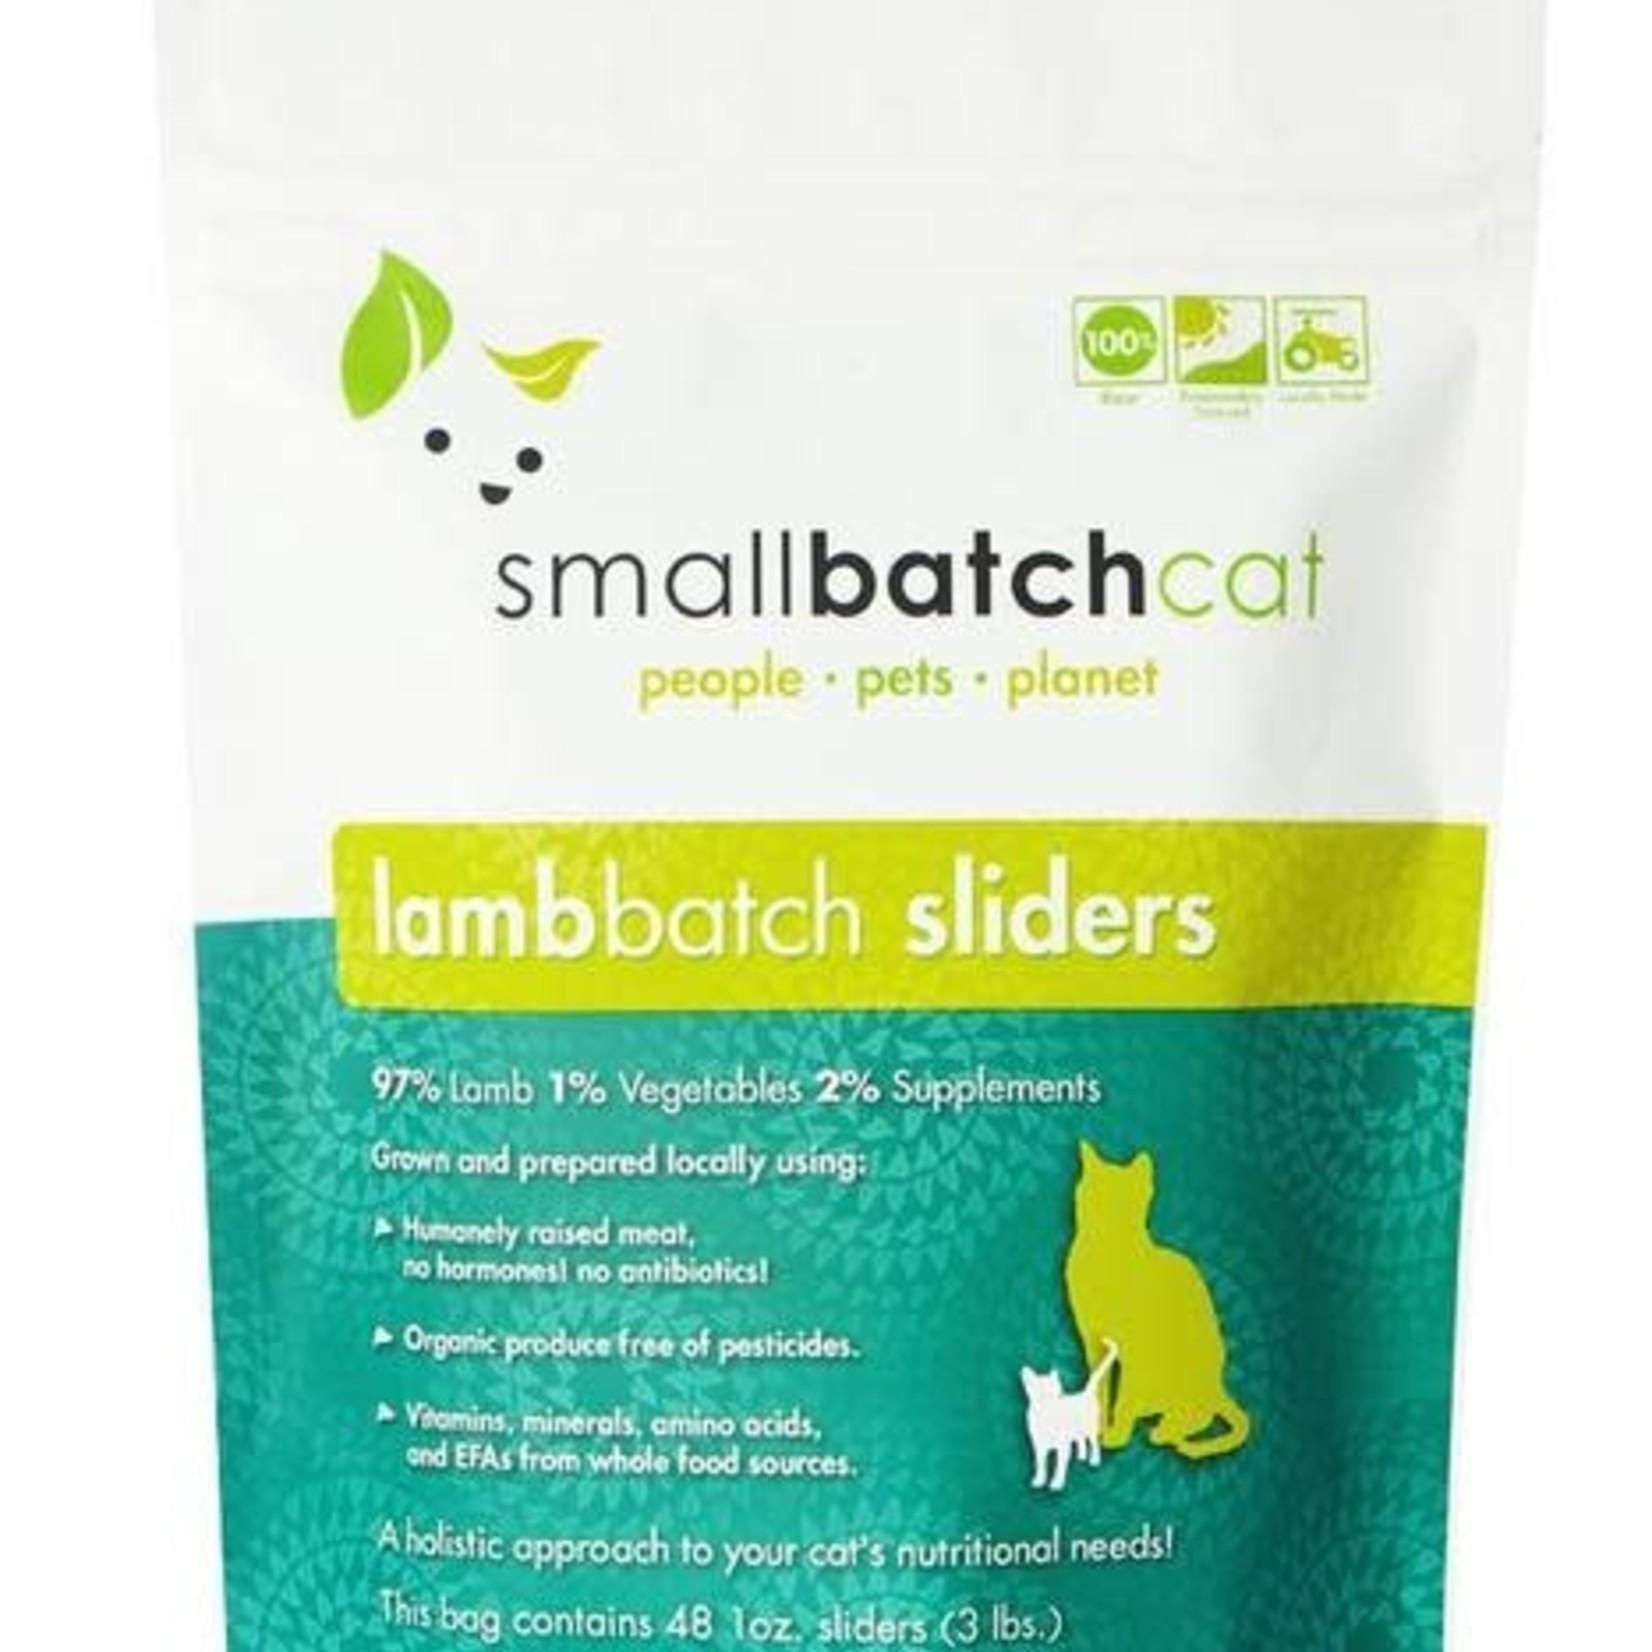 Small Batch Small Batch Cat Frozen Lamb Sliders 3#